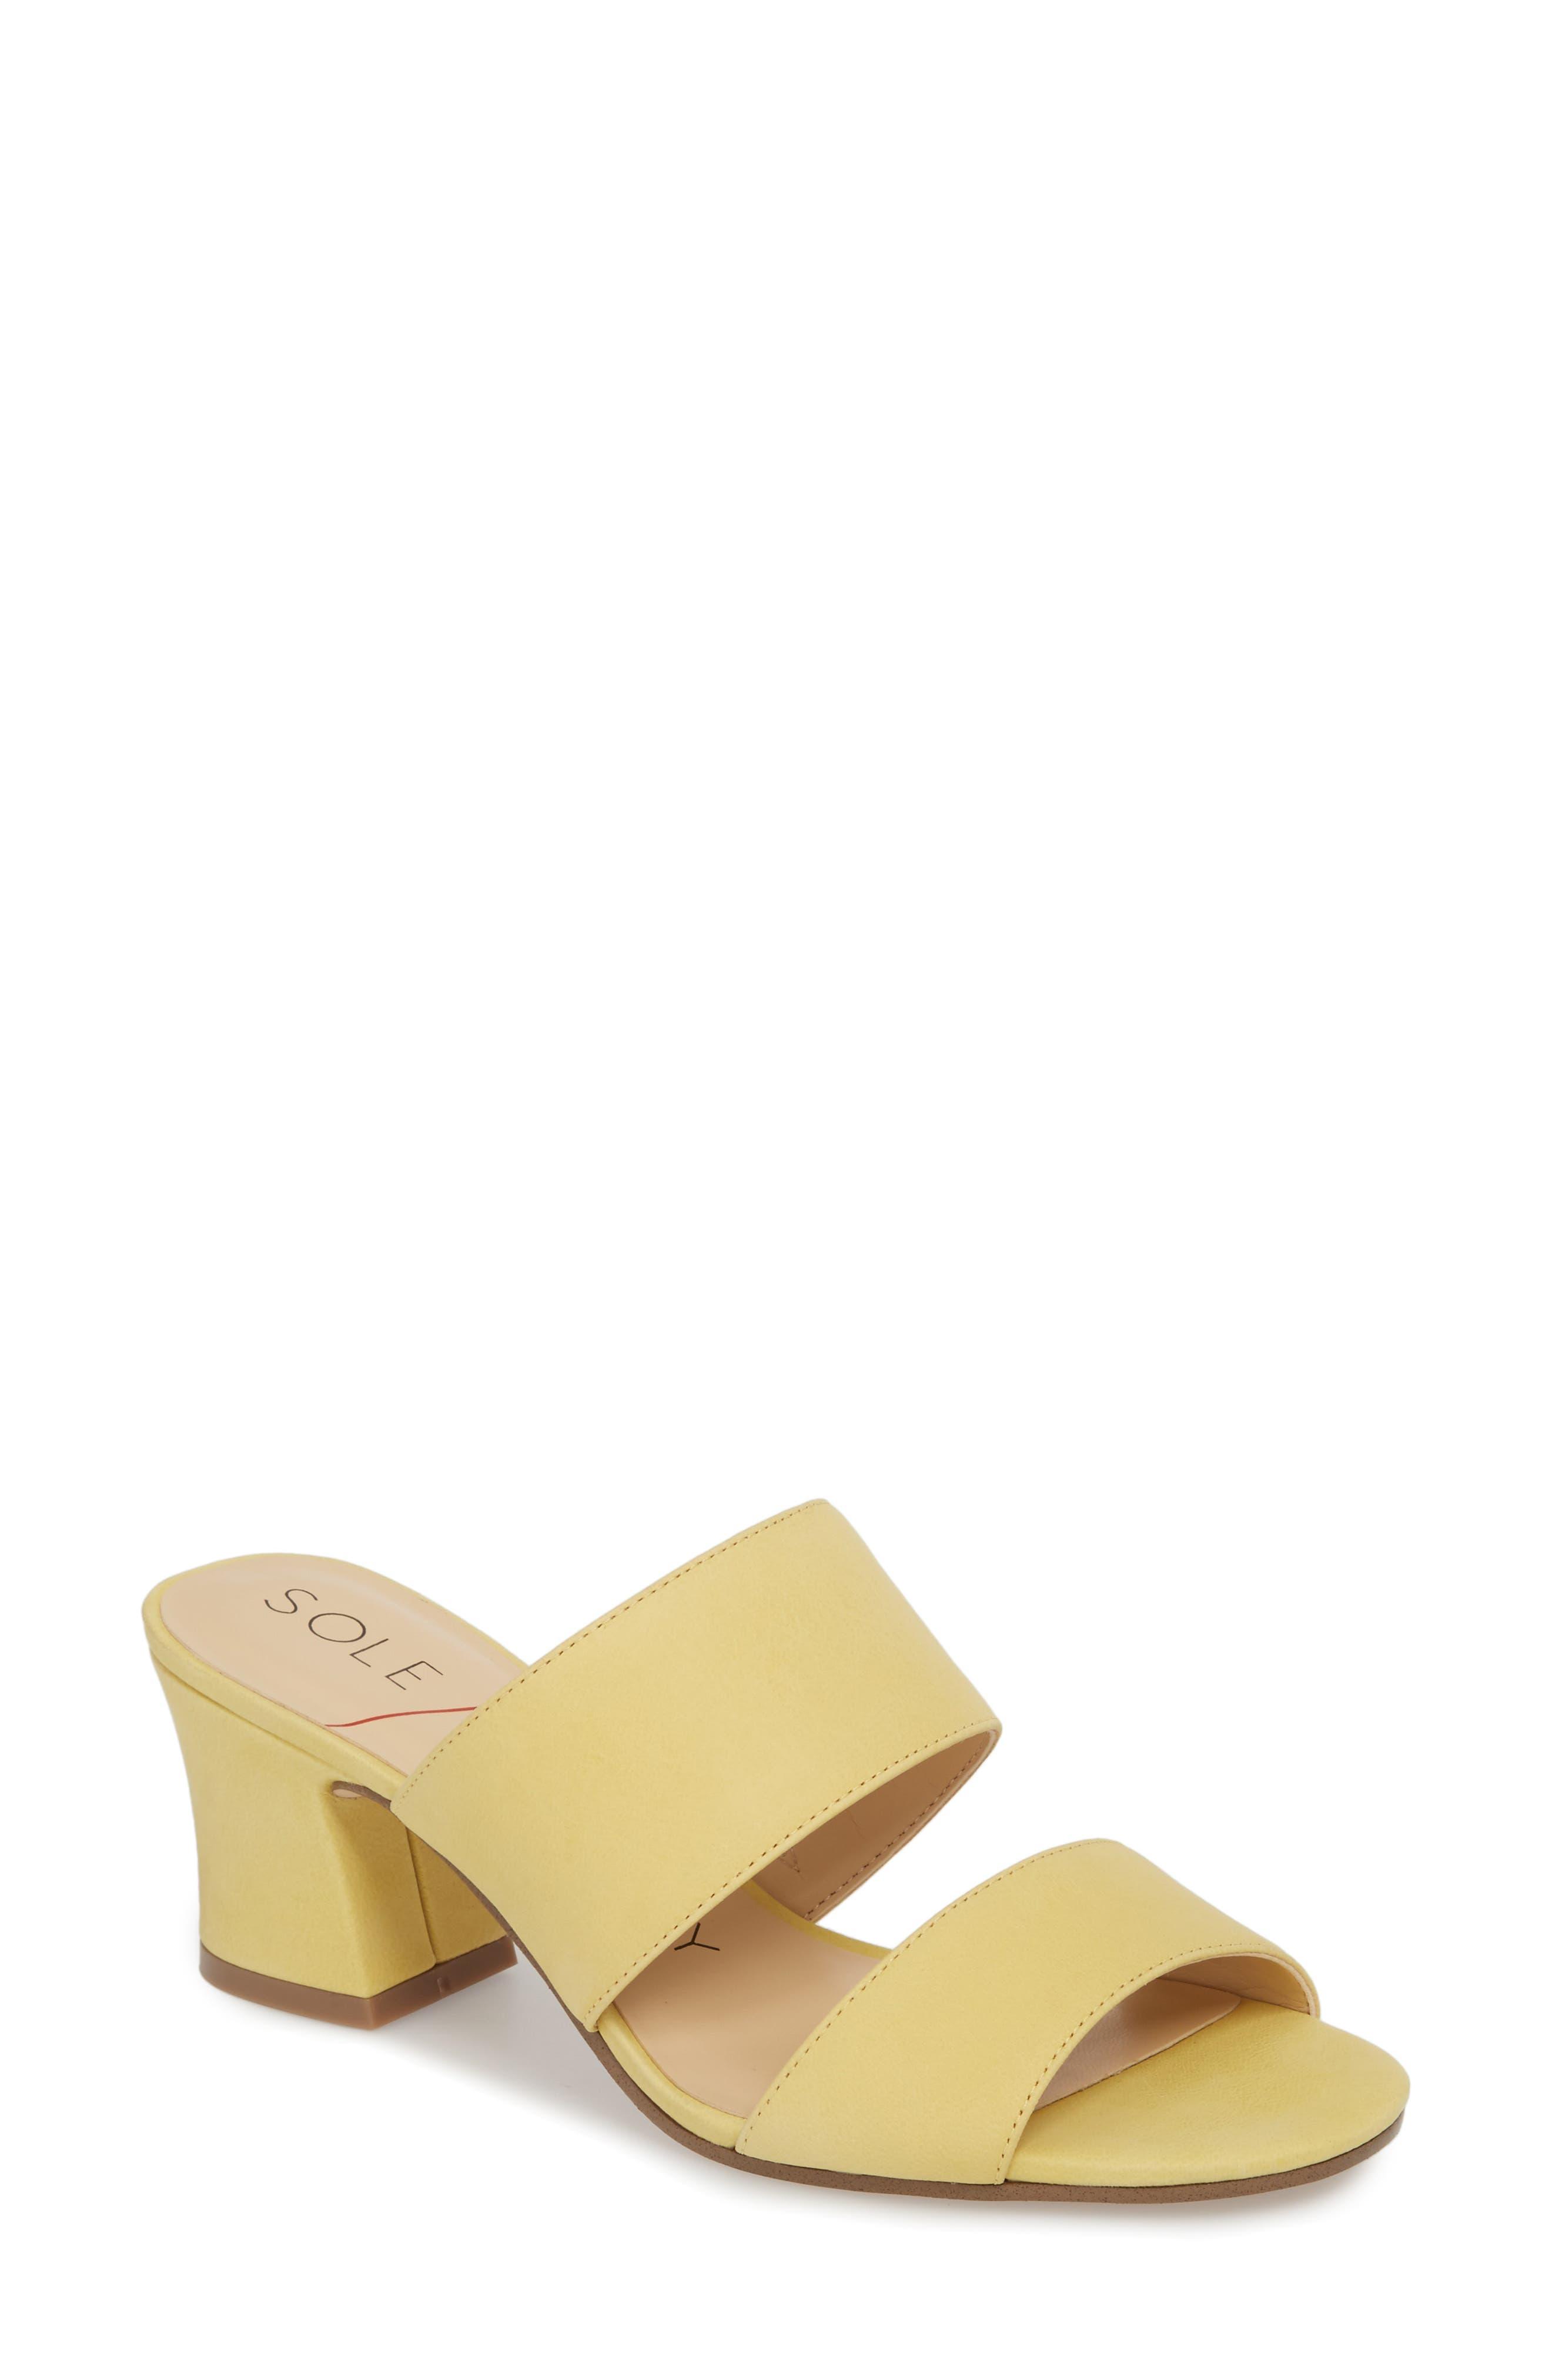 Heline Slide Sandal,                             Main thumbnail 1, color,                             Pale Yellow